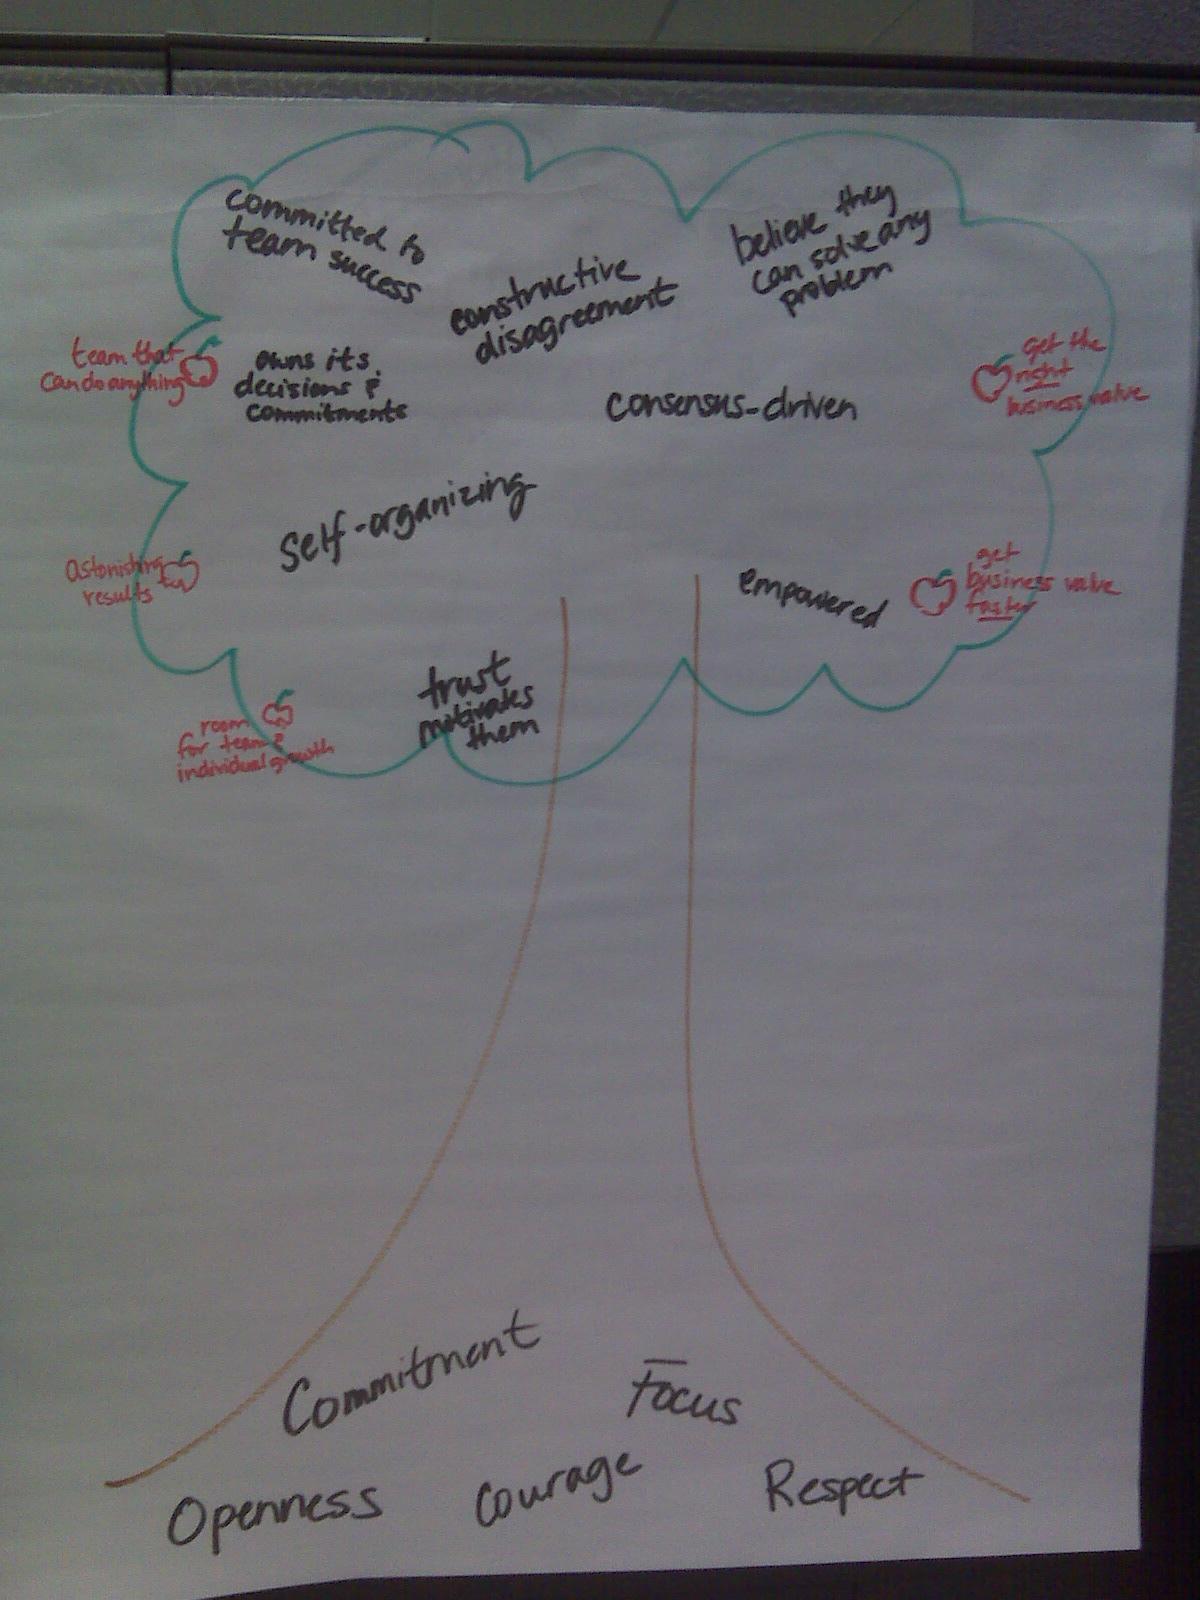 Scrum Values Tree